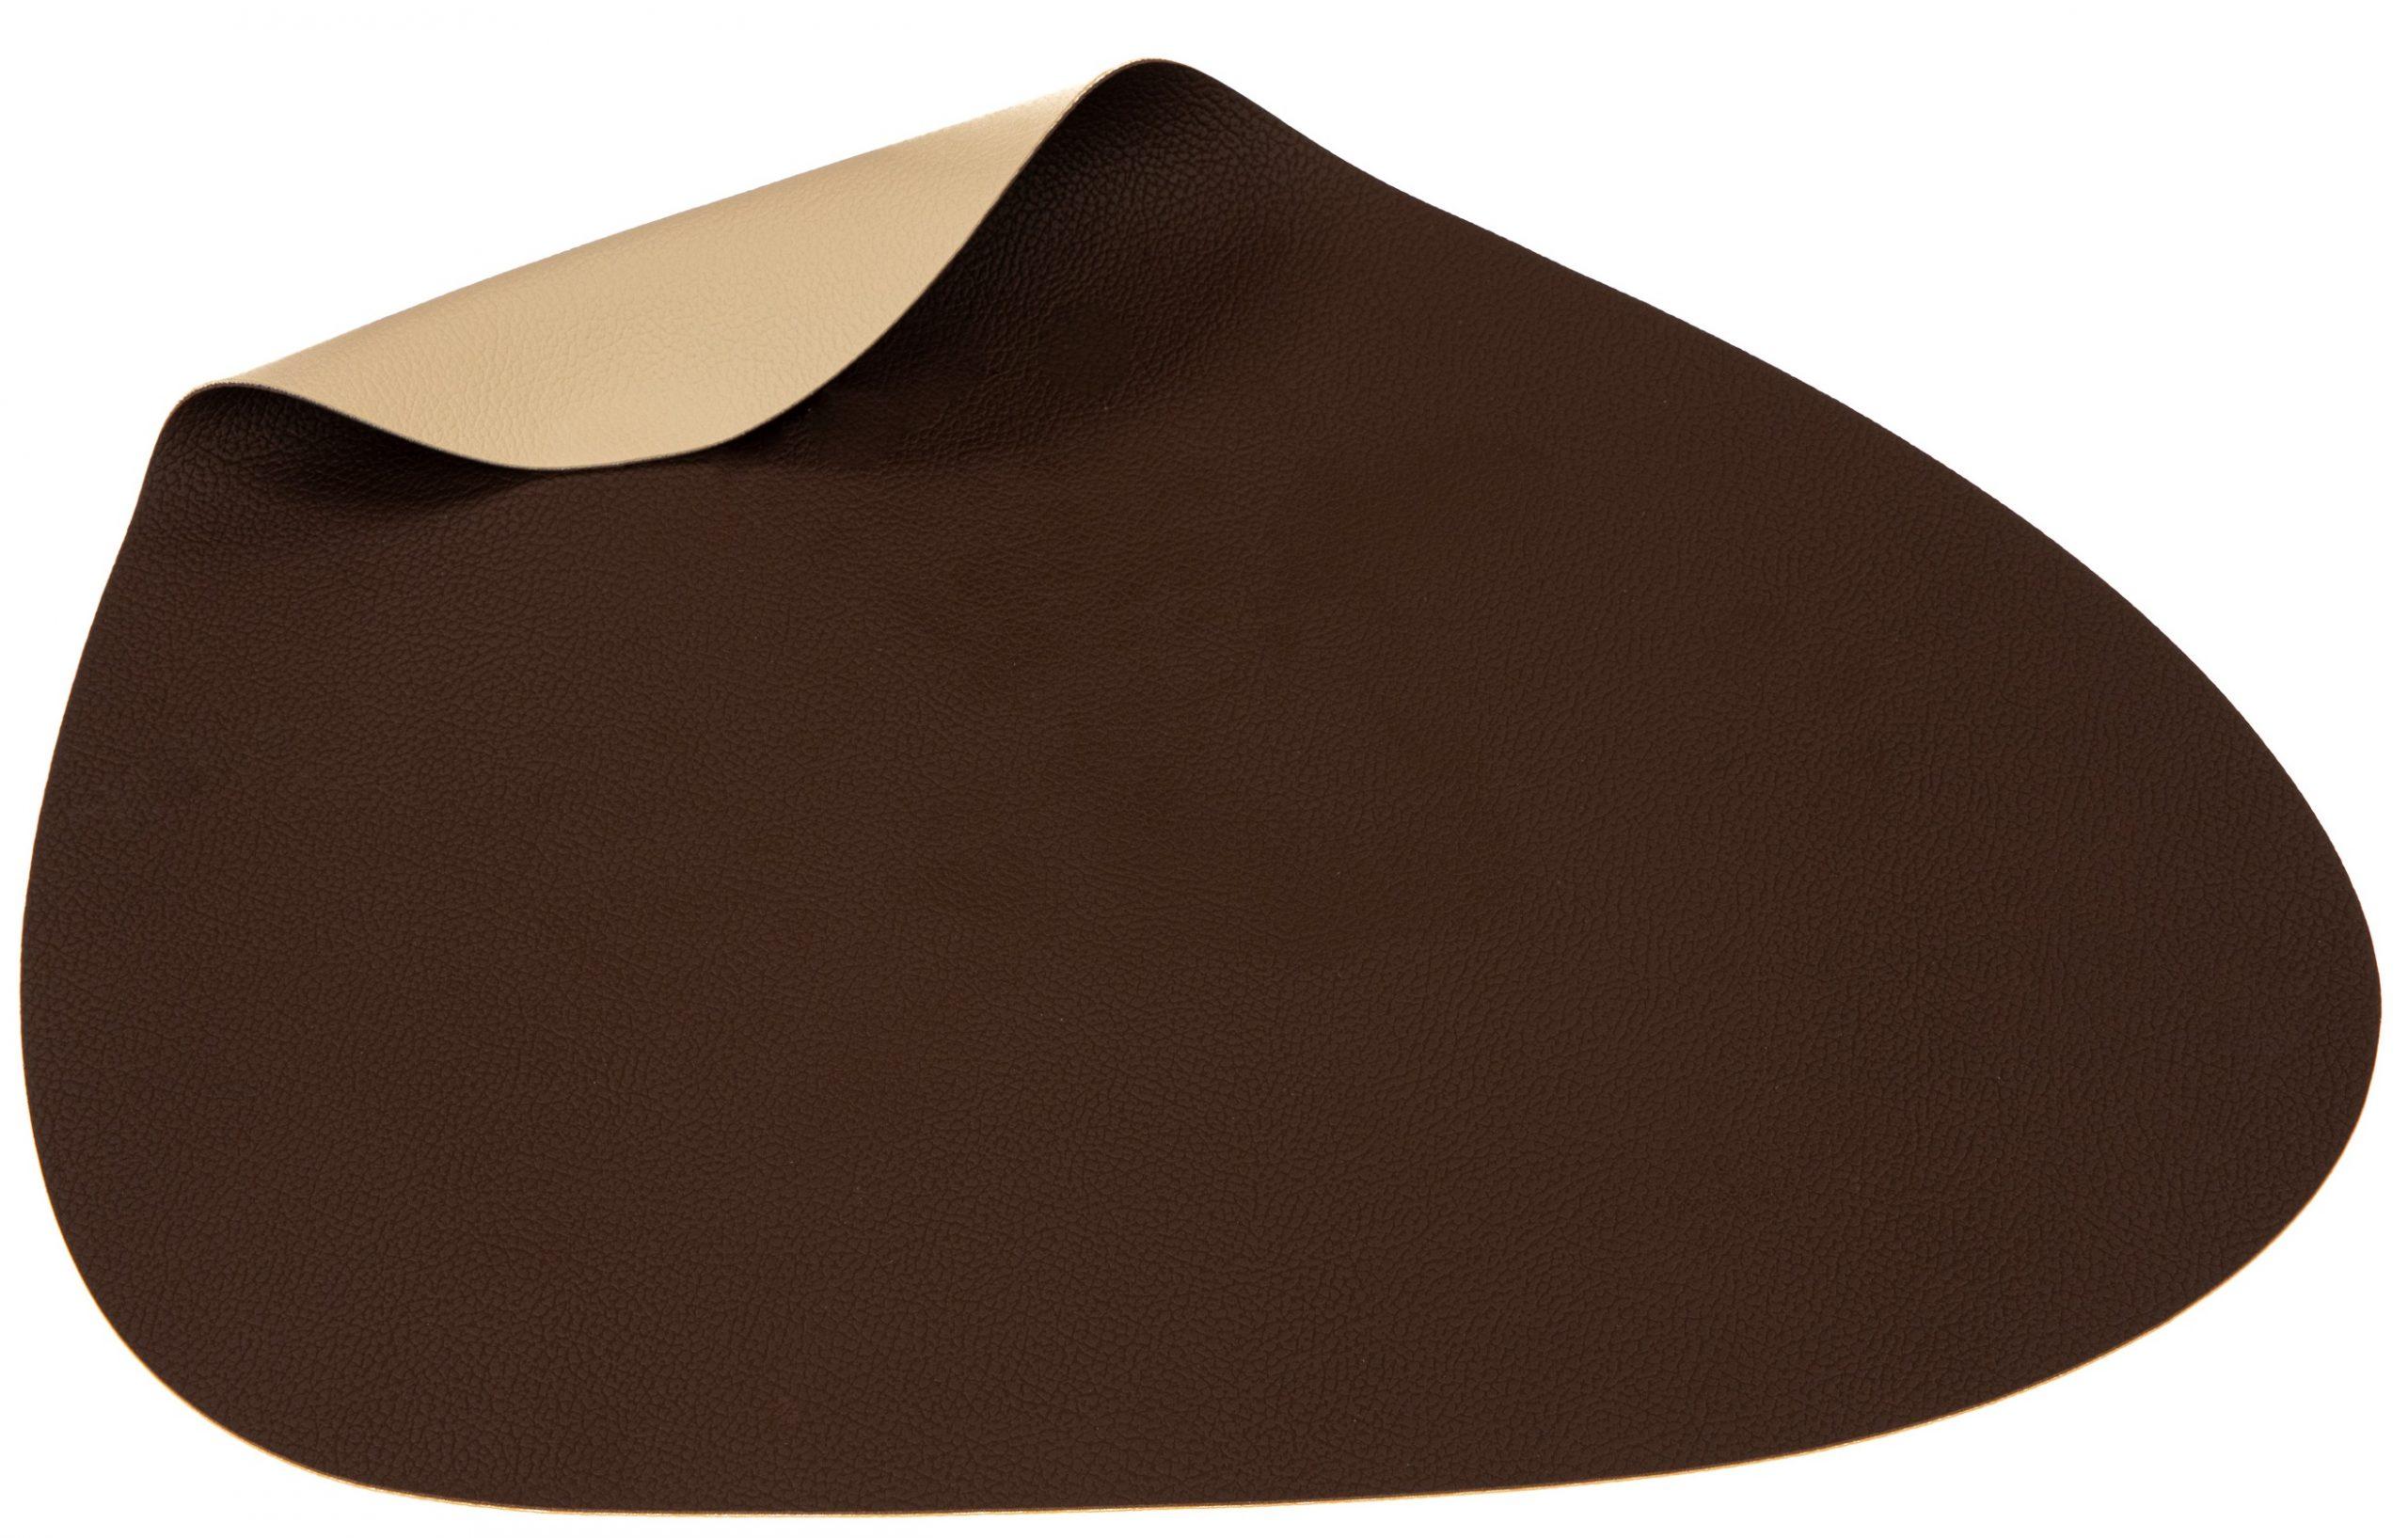 Jay Hill Placemats Leer Bruin Zand Organic 37 x 44 cm - 6 Stuks